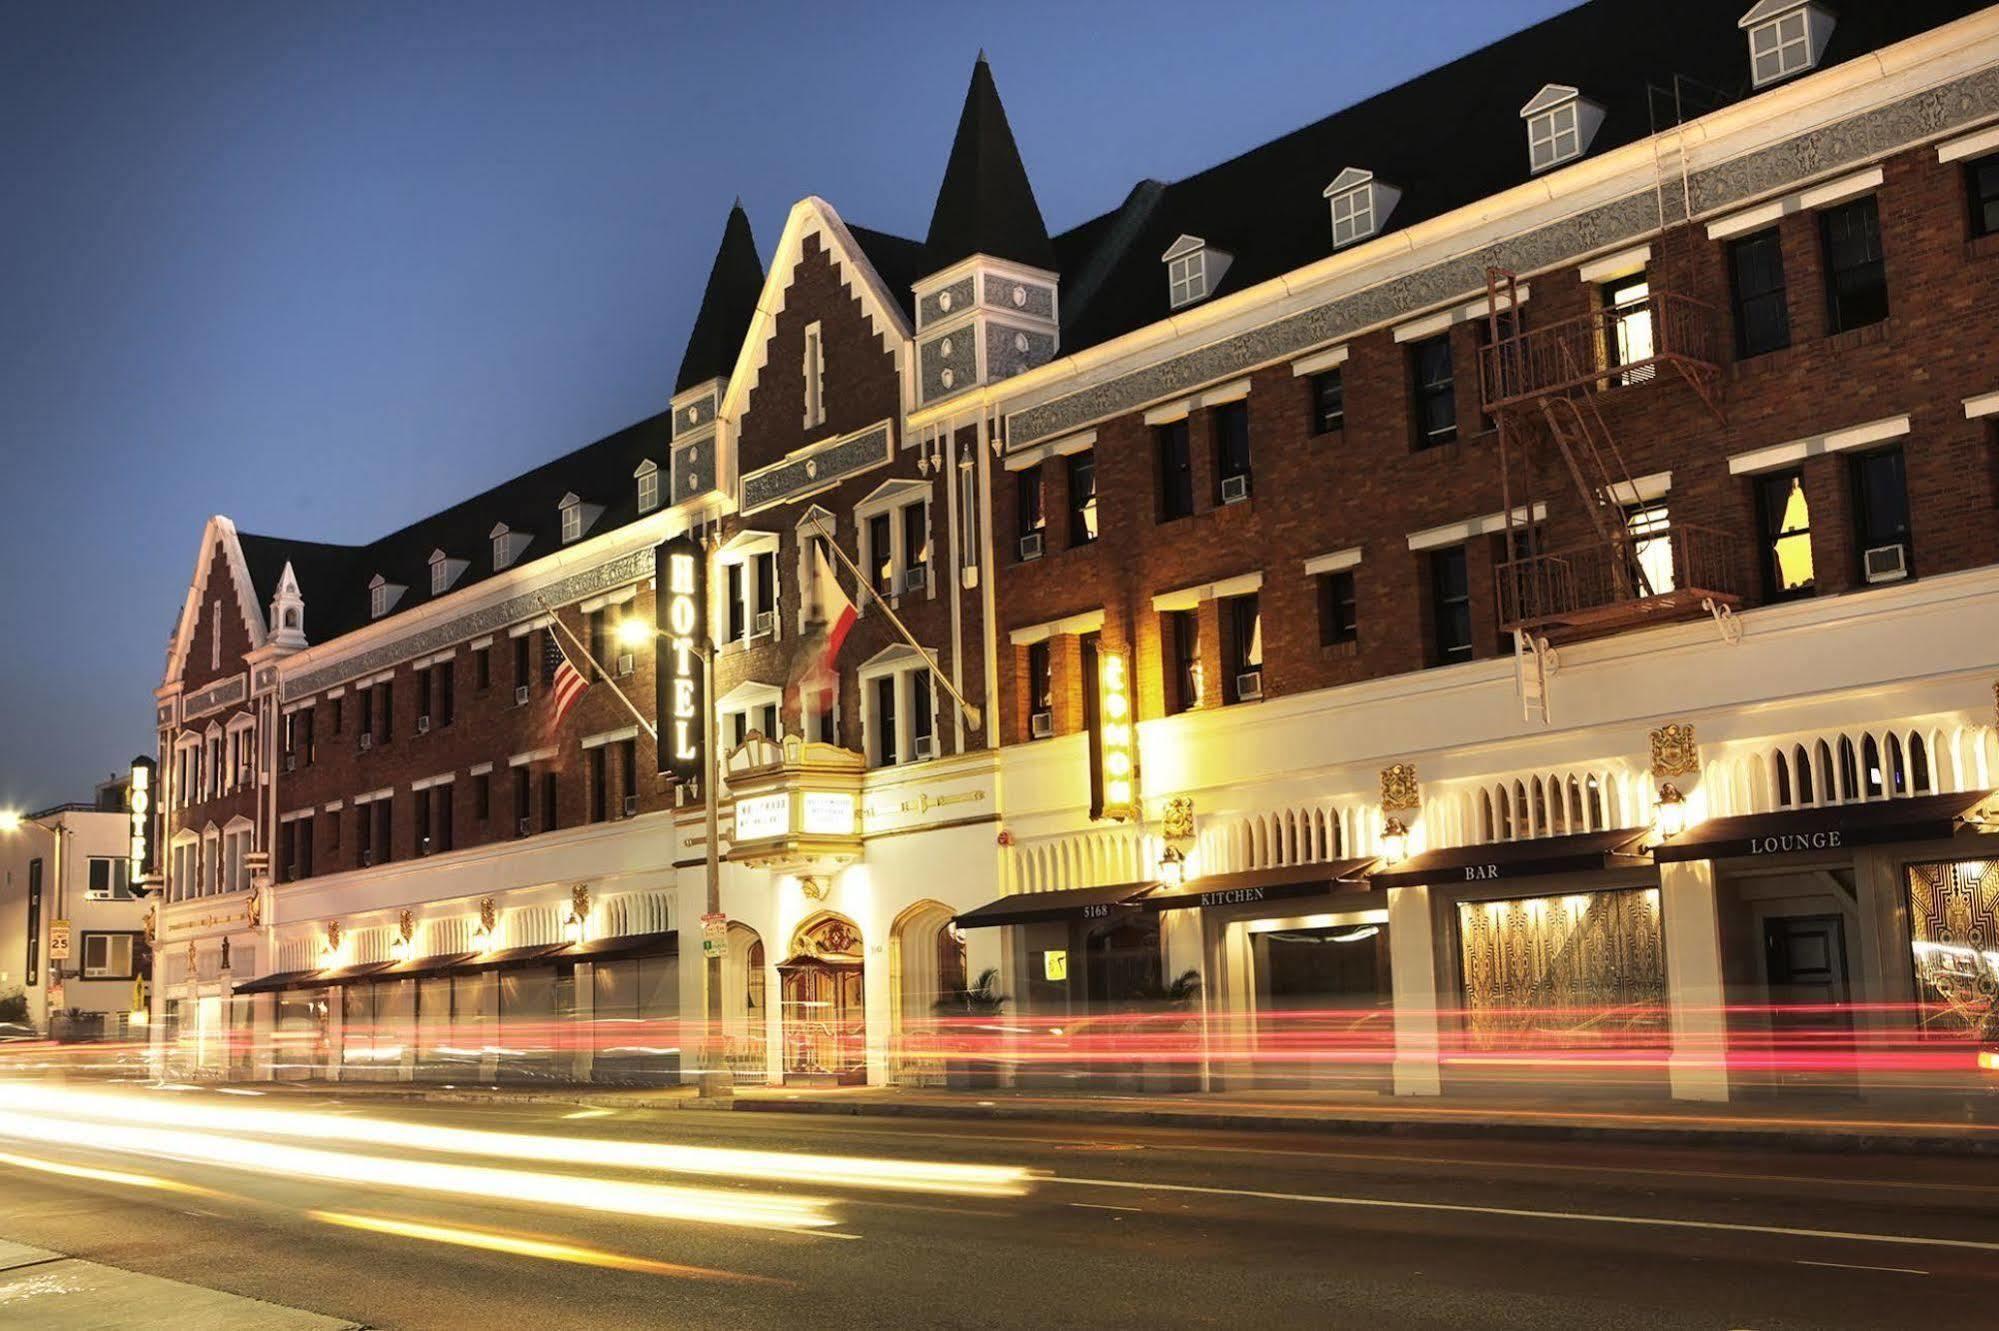 HOLLYWOOD HISTORIC HOTEL, LOS ANGELES ***